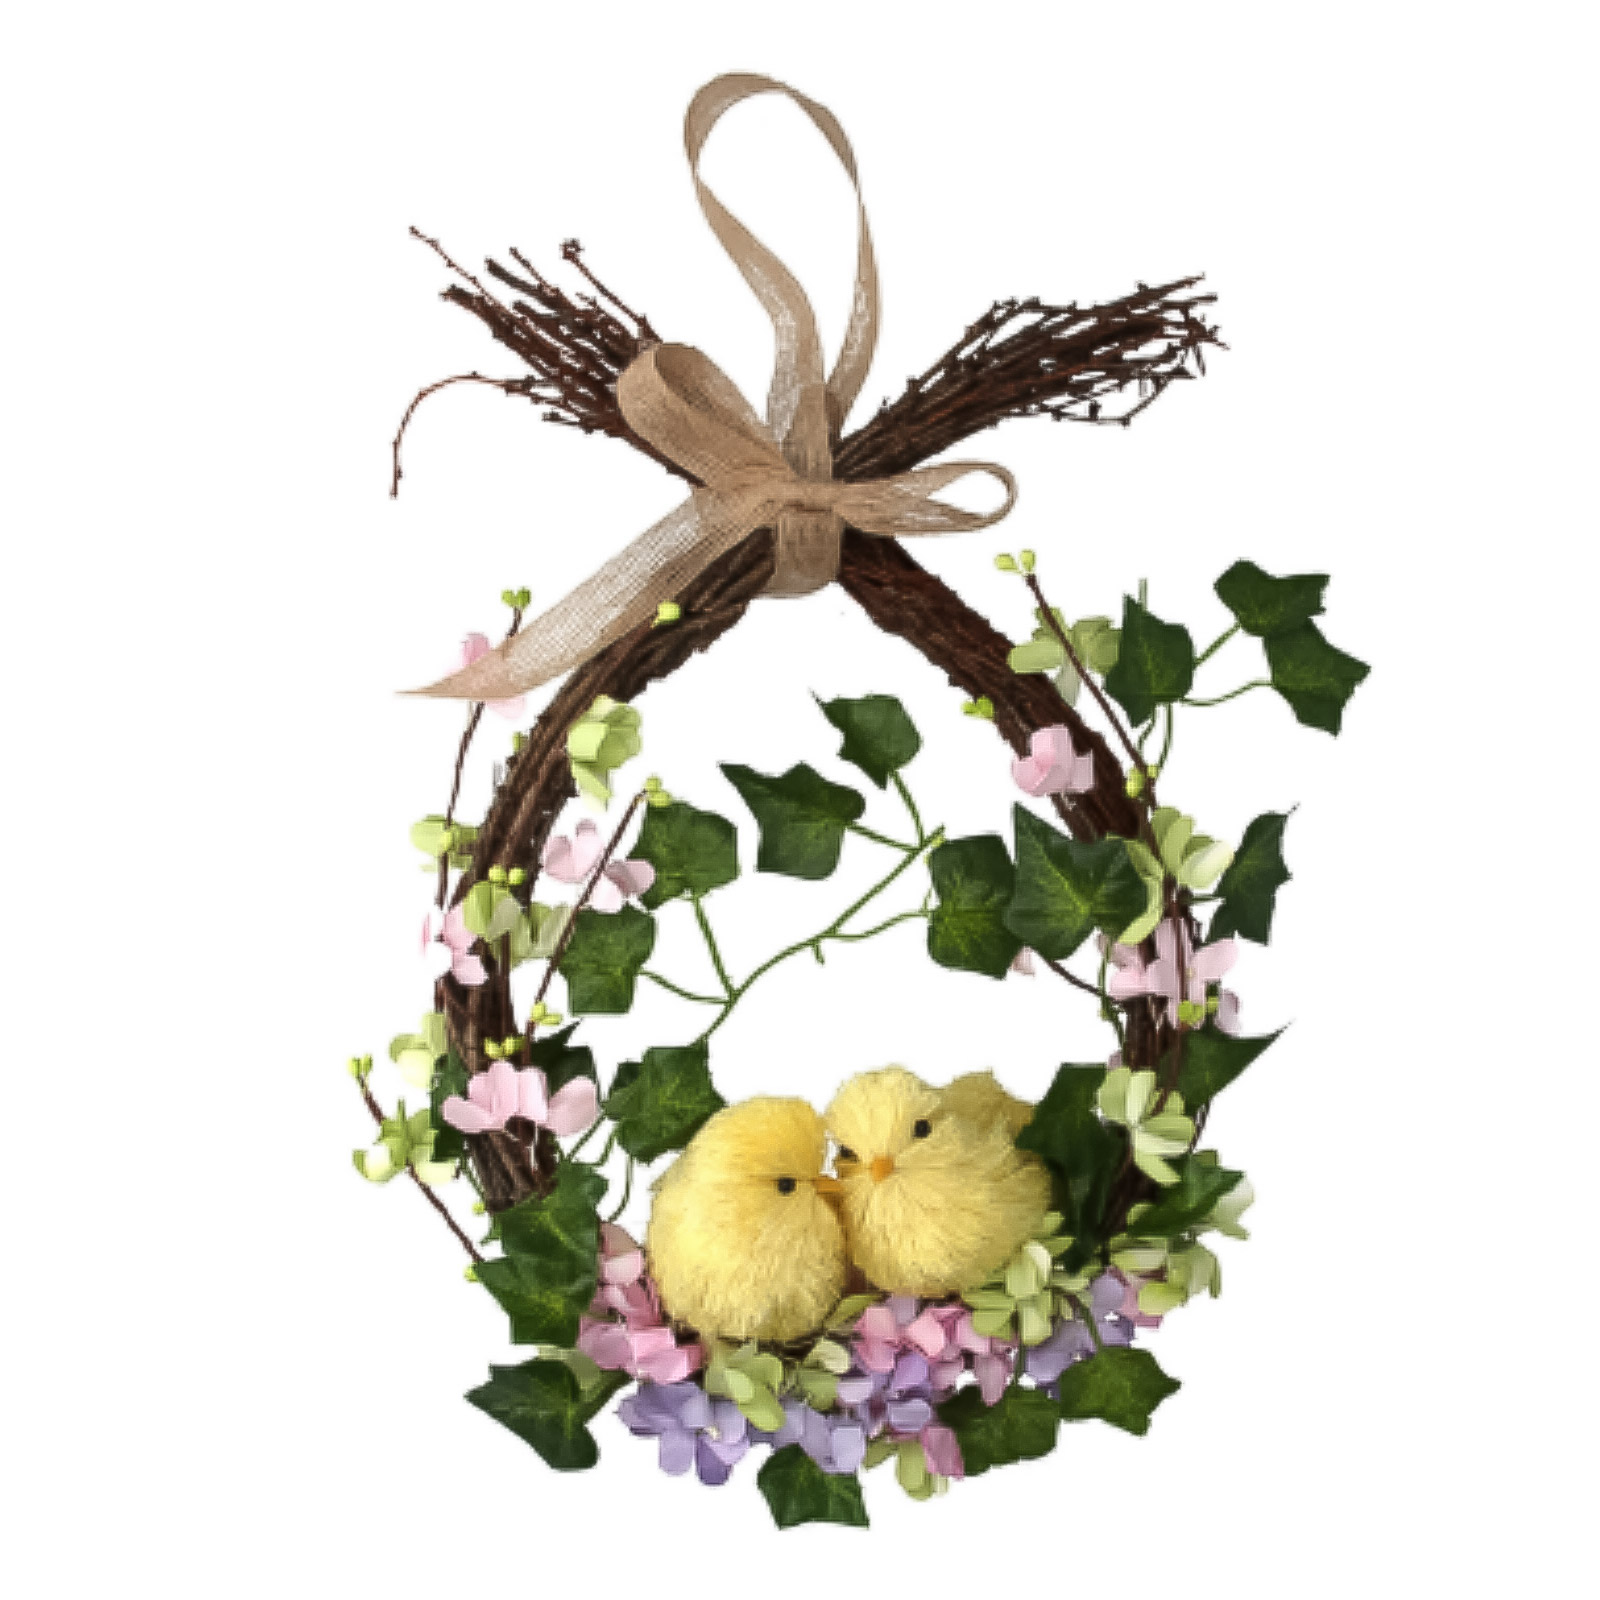 Gisela-Graham-Primavera-Corona-Decoracion-de-Mesa-de-huevos-de-Pascua-Flores-Casa-Puerta-Floral miniatura 8